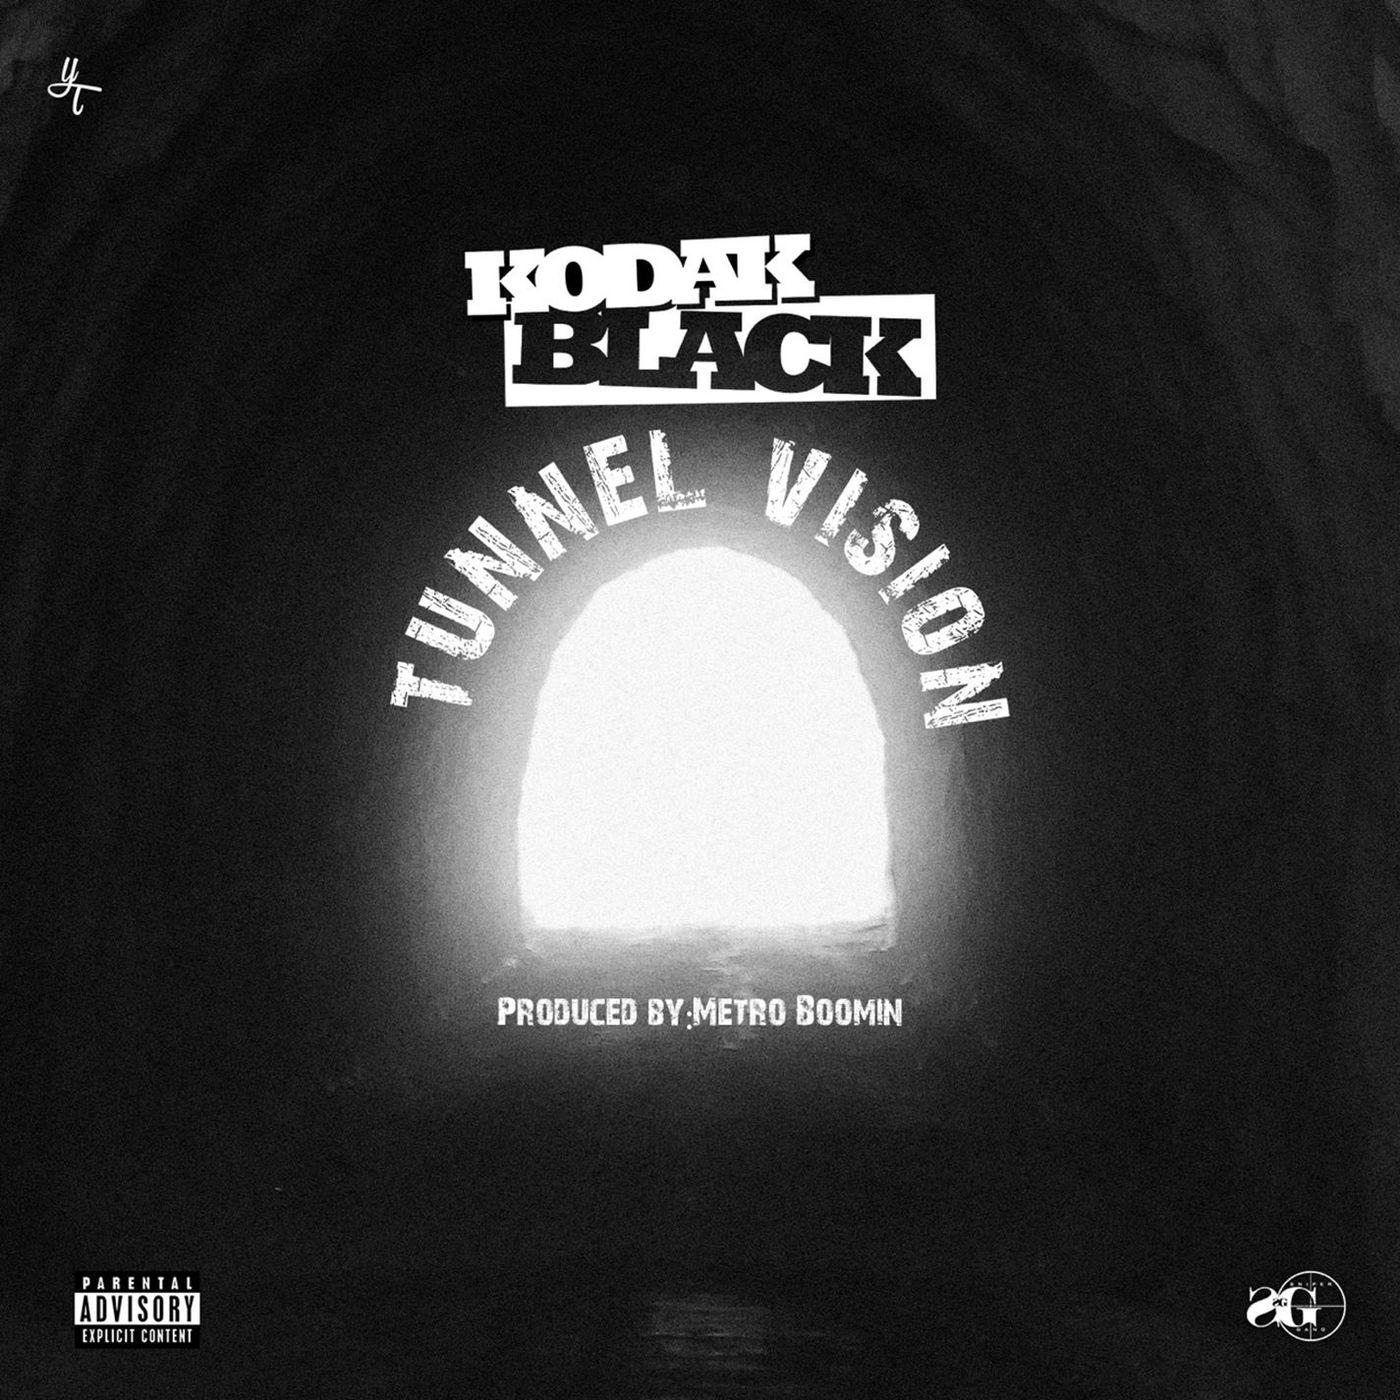 Kodak Black - Tunnel Vision - Single Cover